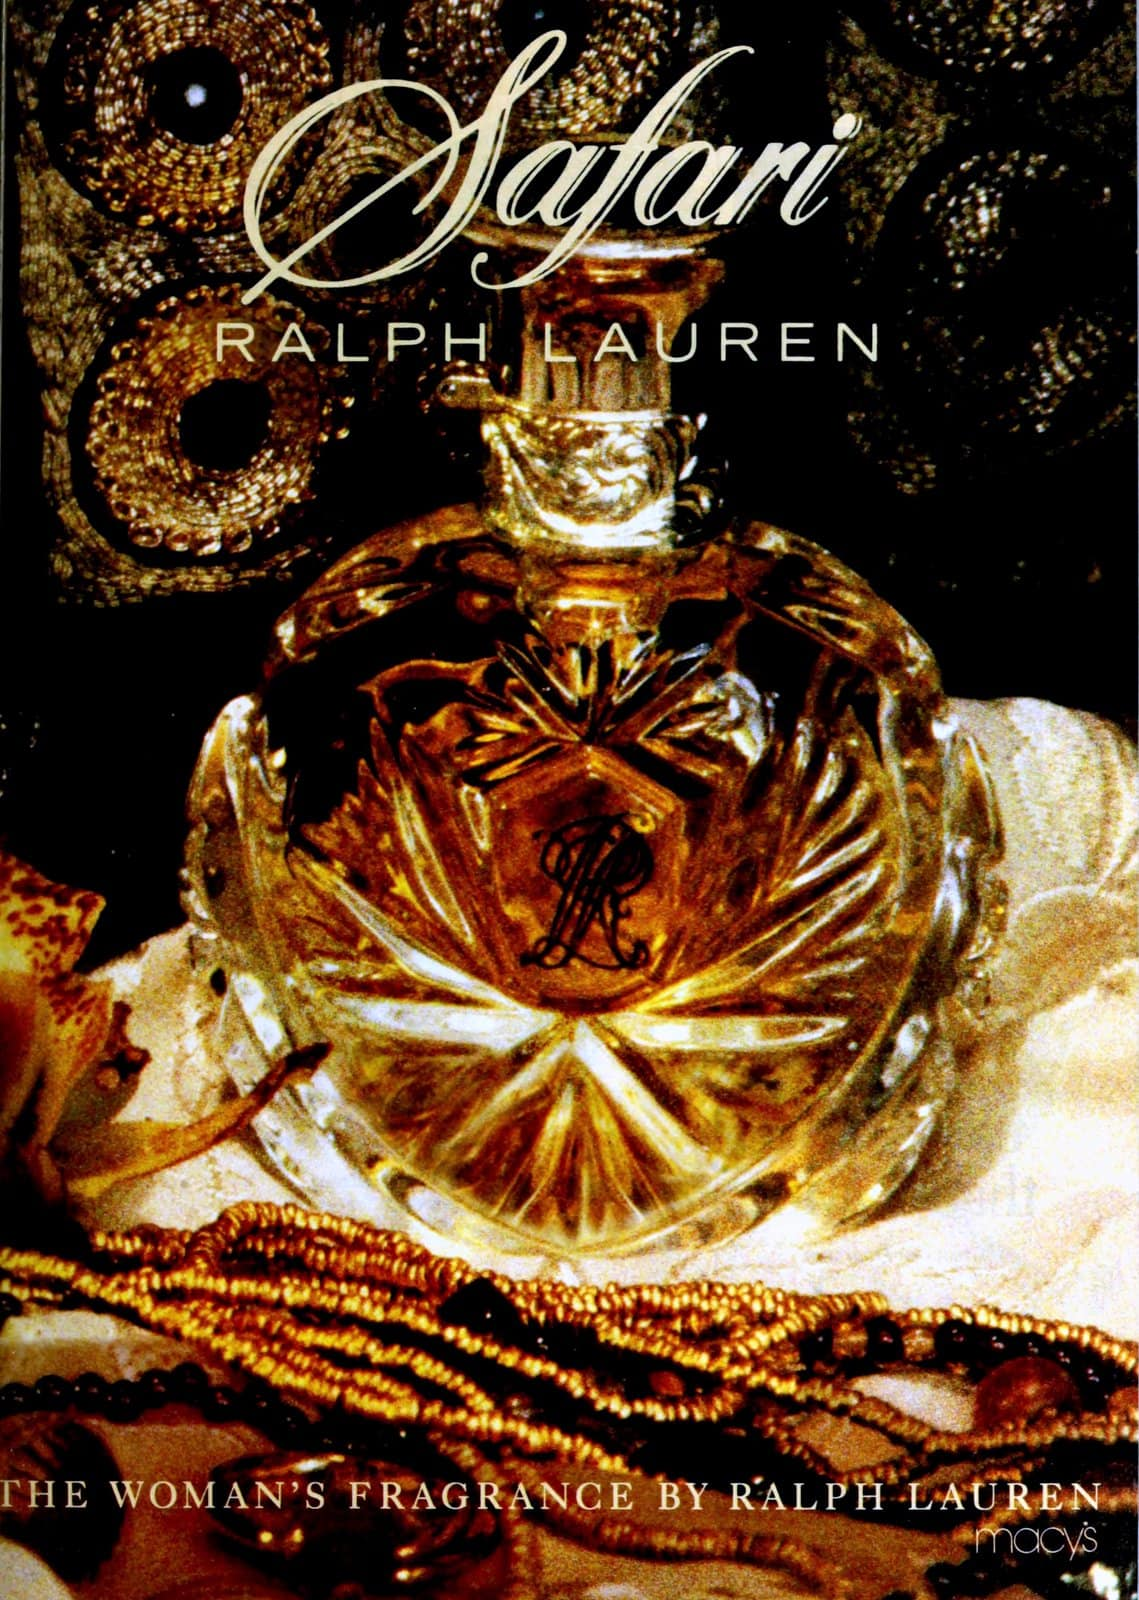 Safari women's fragrance from Ralph Lauren (1993) at ClickAmericana.com